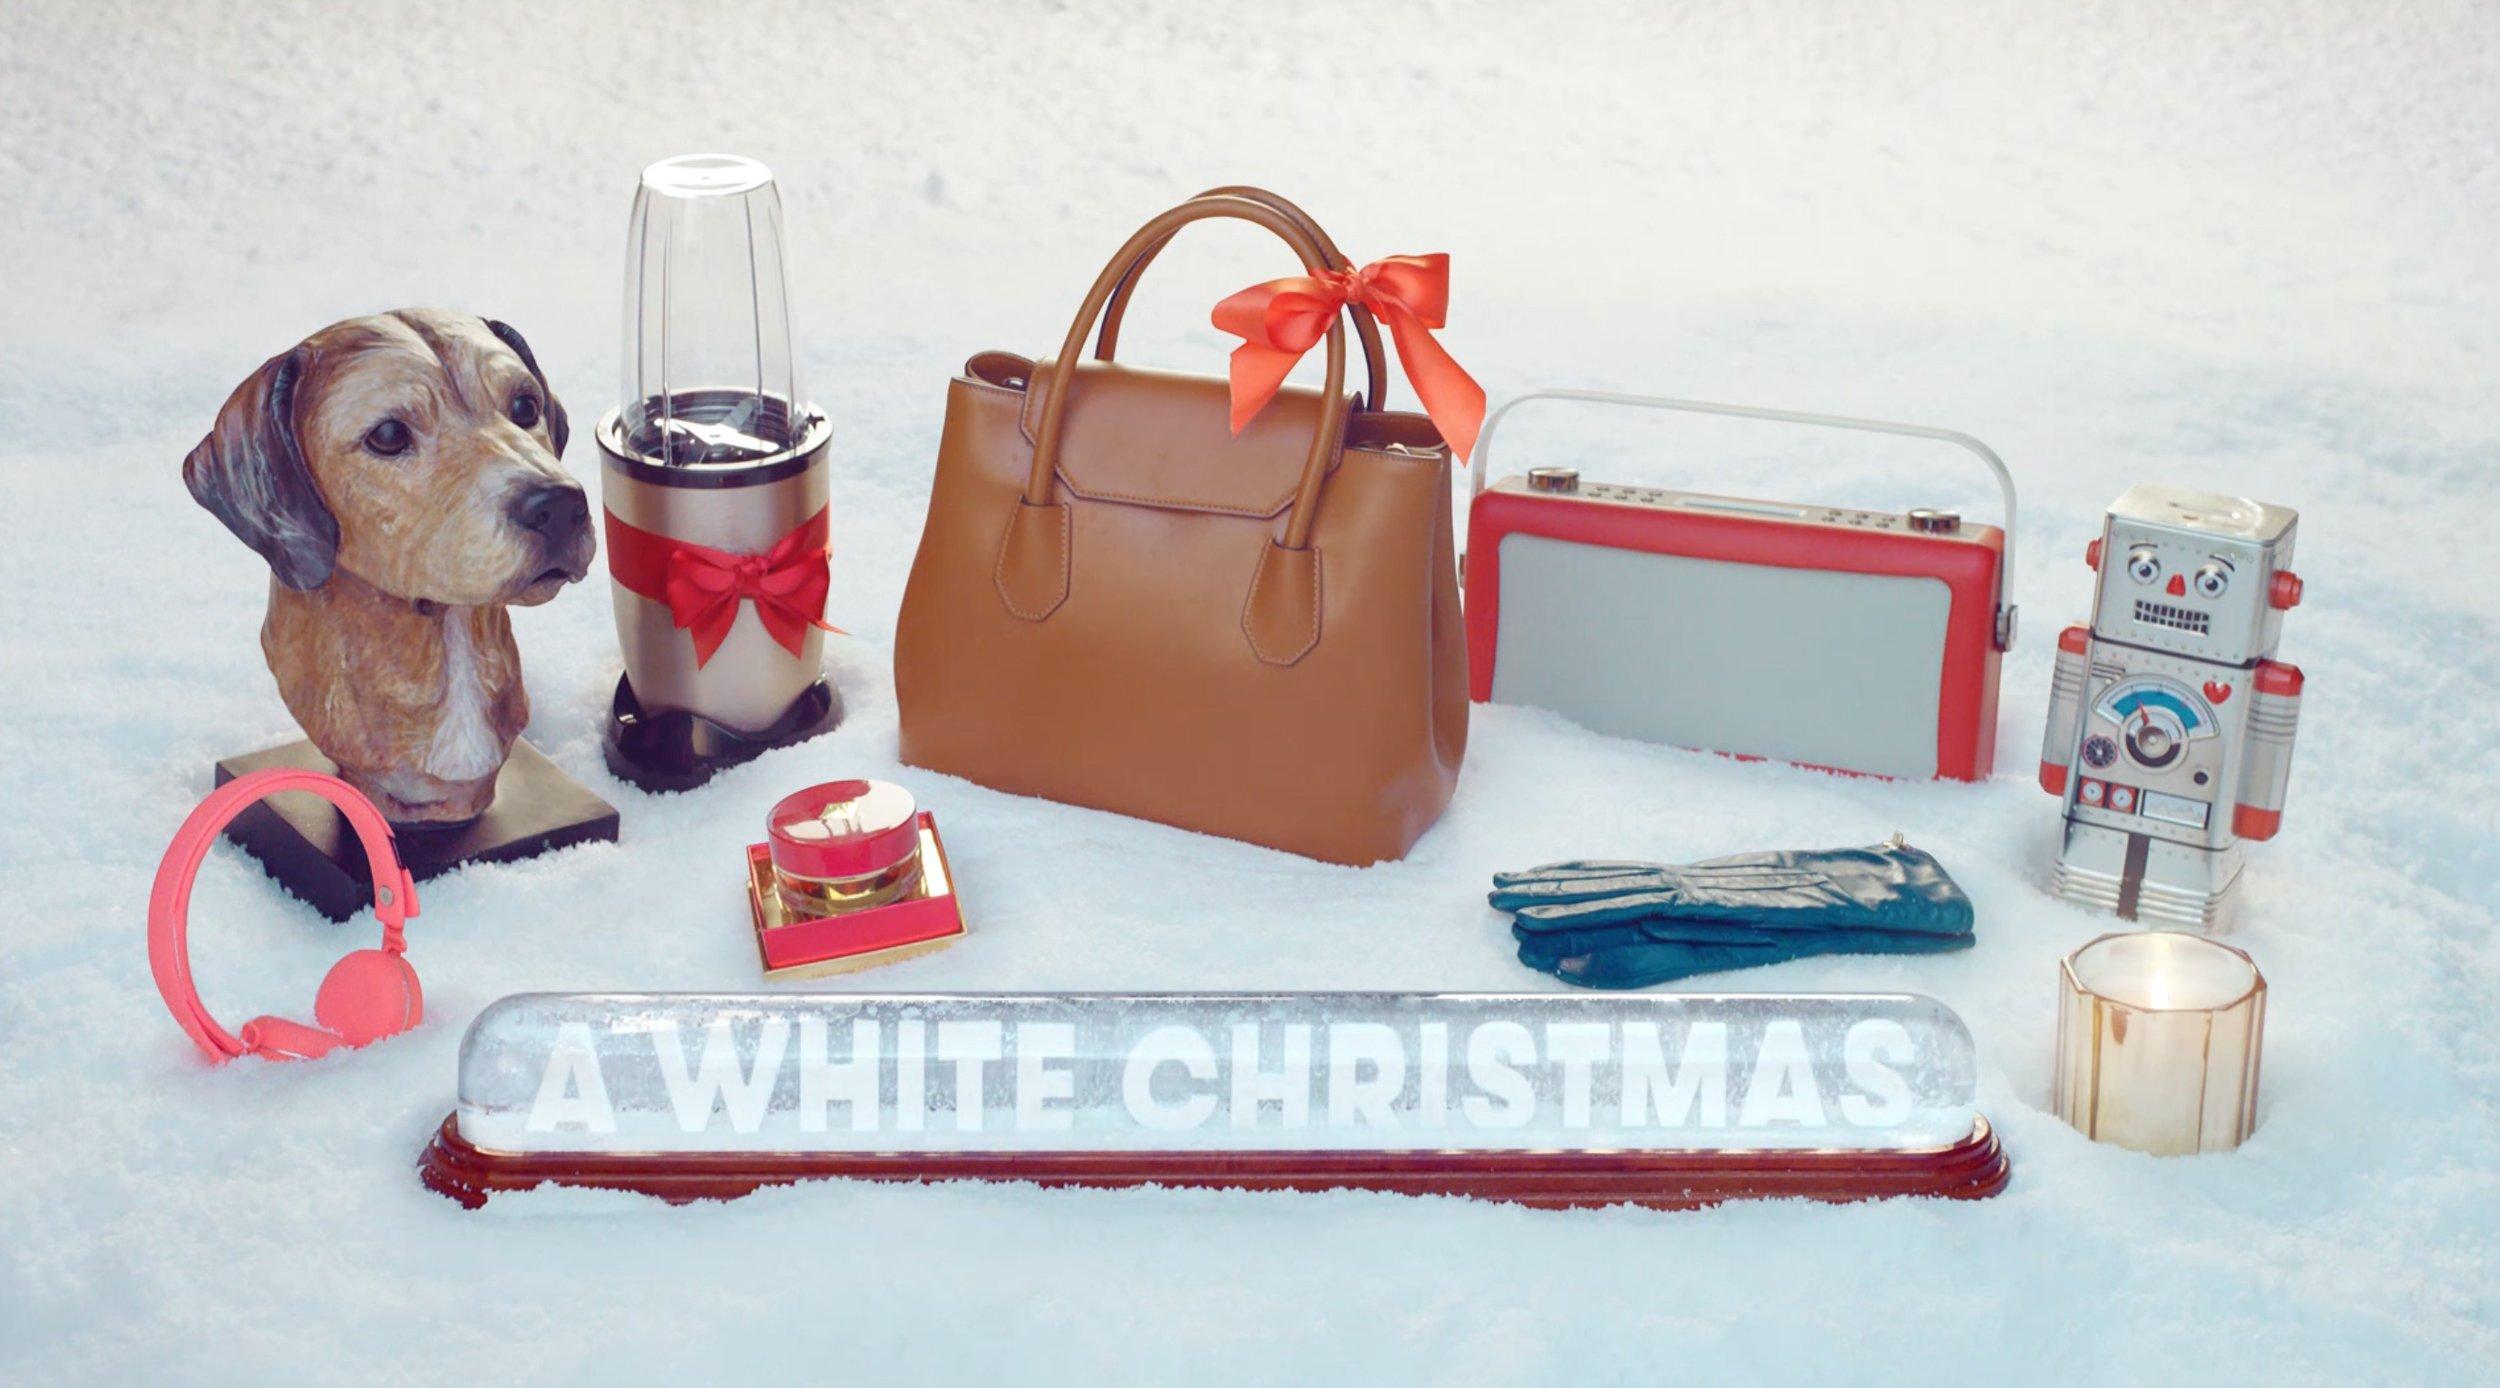 tk maxx - (the actual) white christmas - TV cut